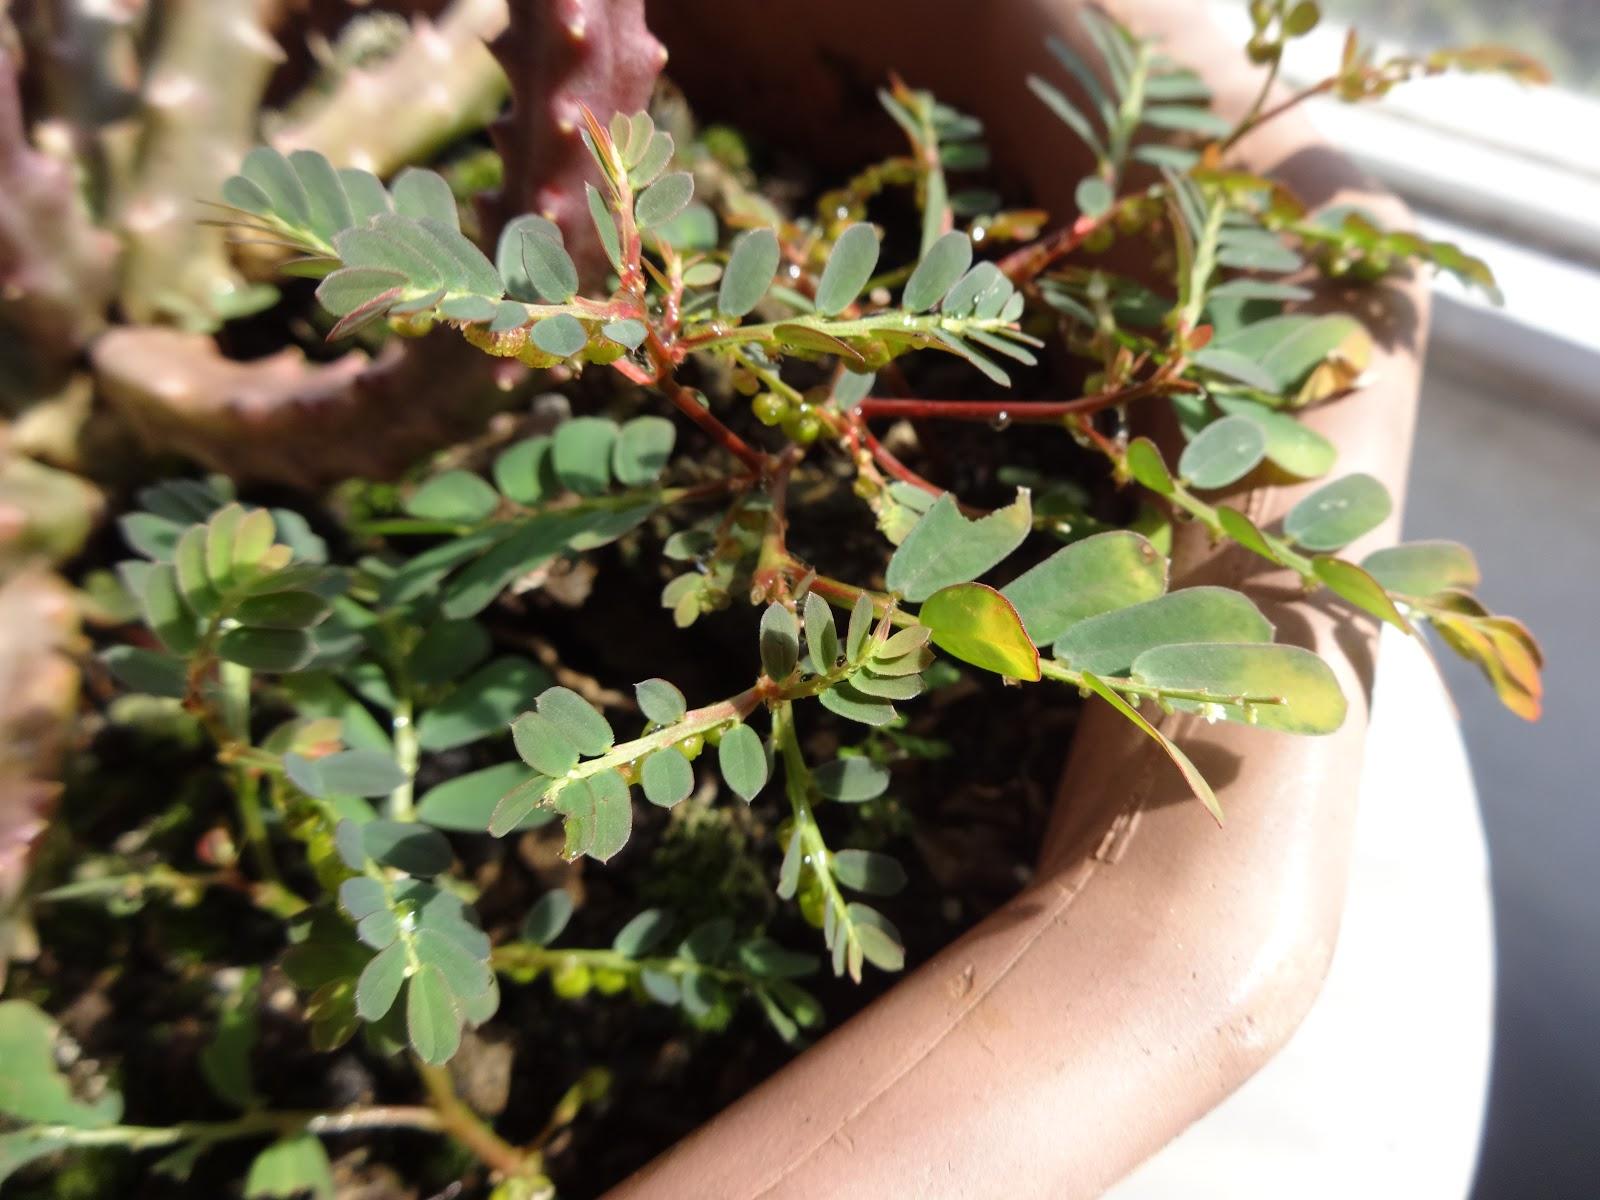 Phyllanthus niruri medicinal study